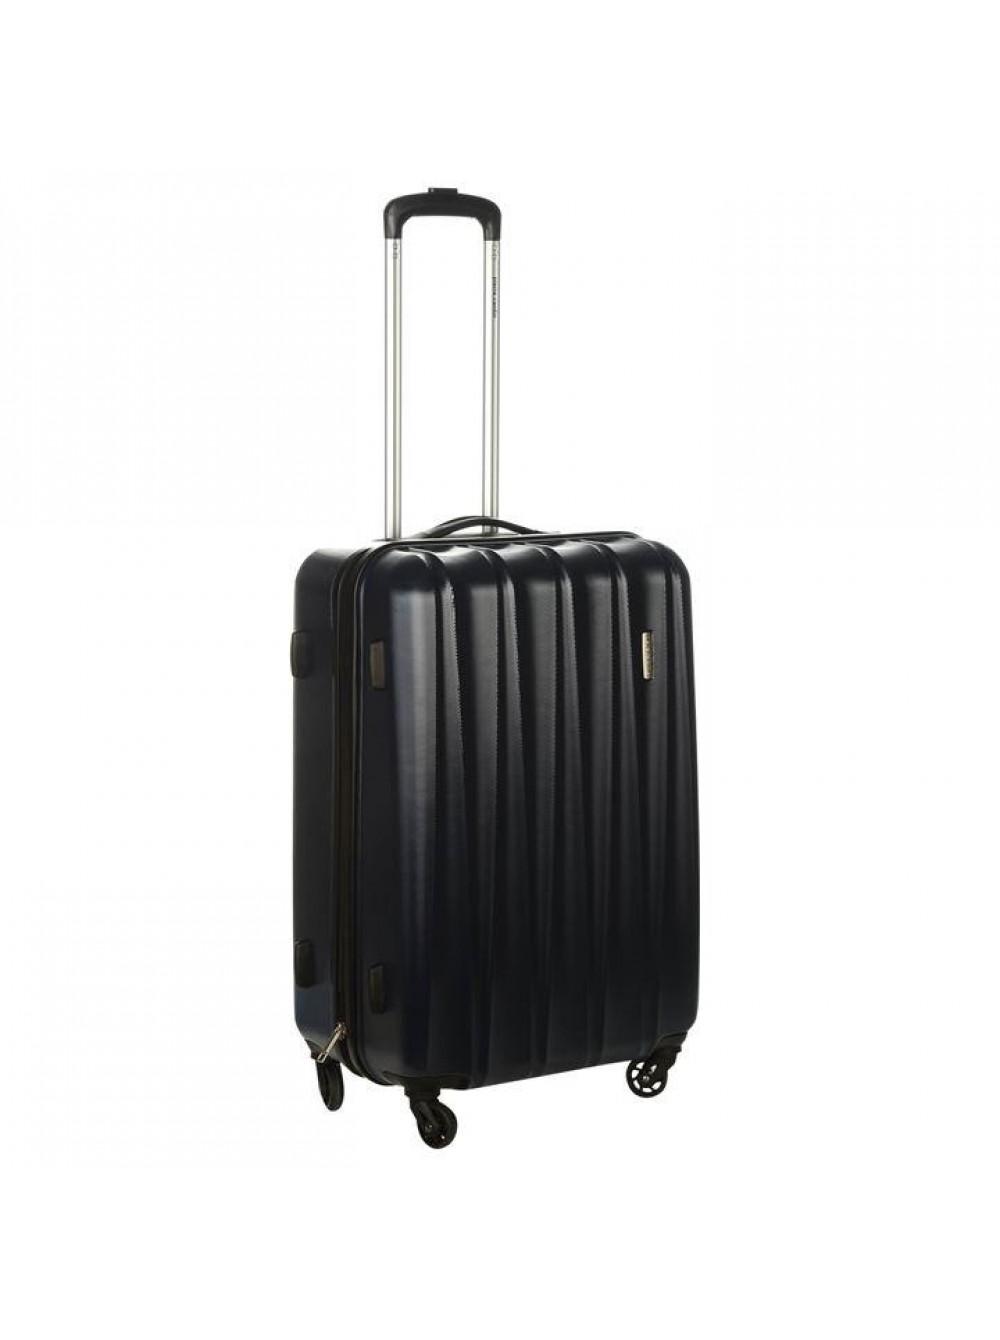 b87db796354d Pierre Cardin Ria - Сумка чемодан на колесах - Чемодан для путешествий